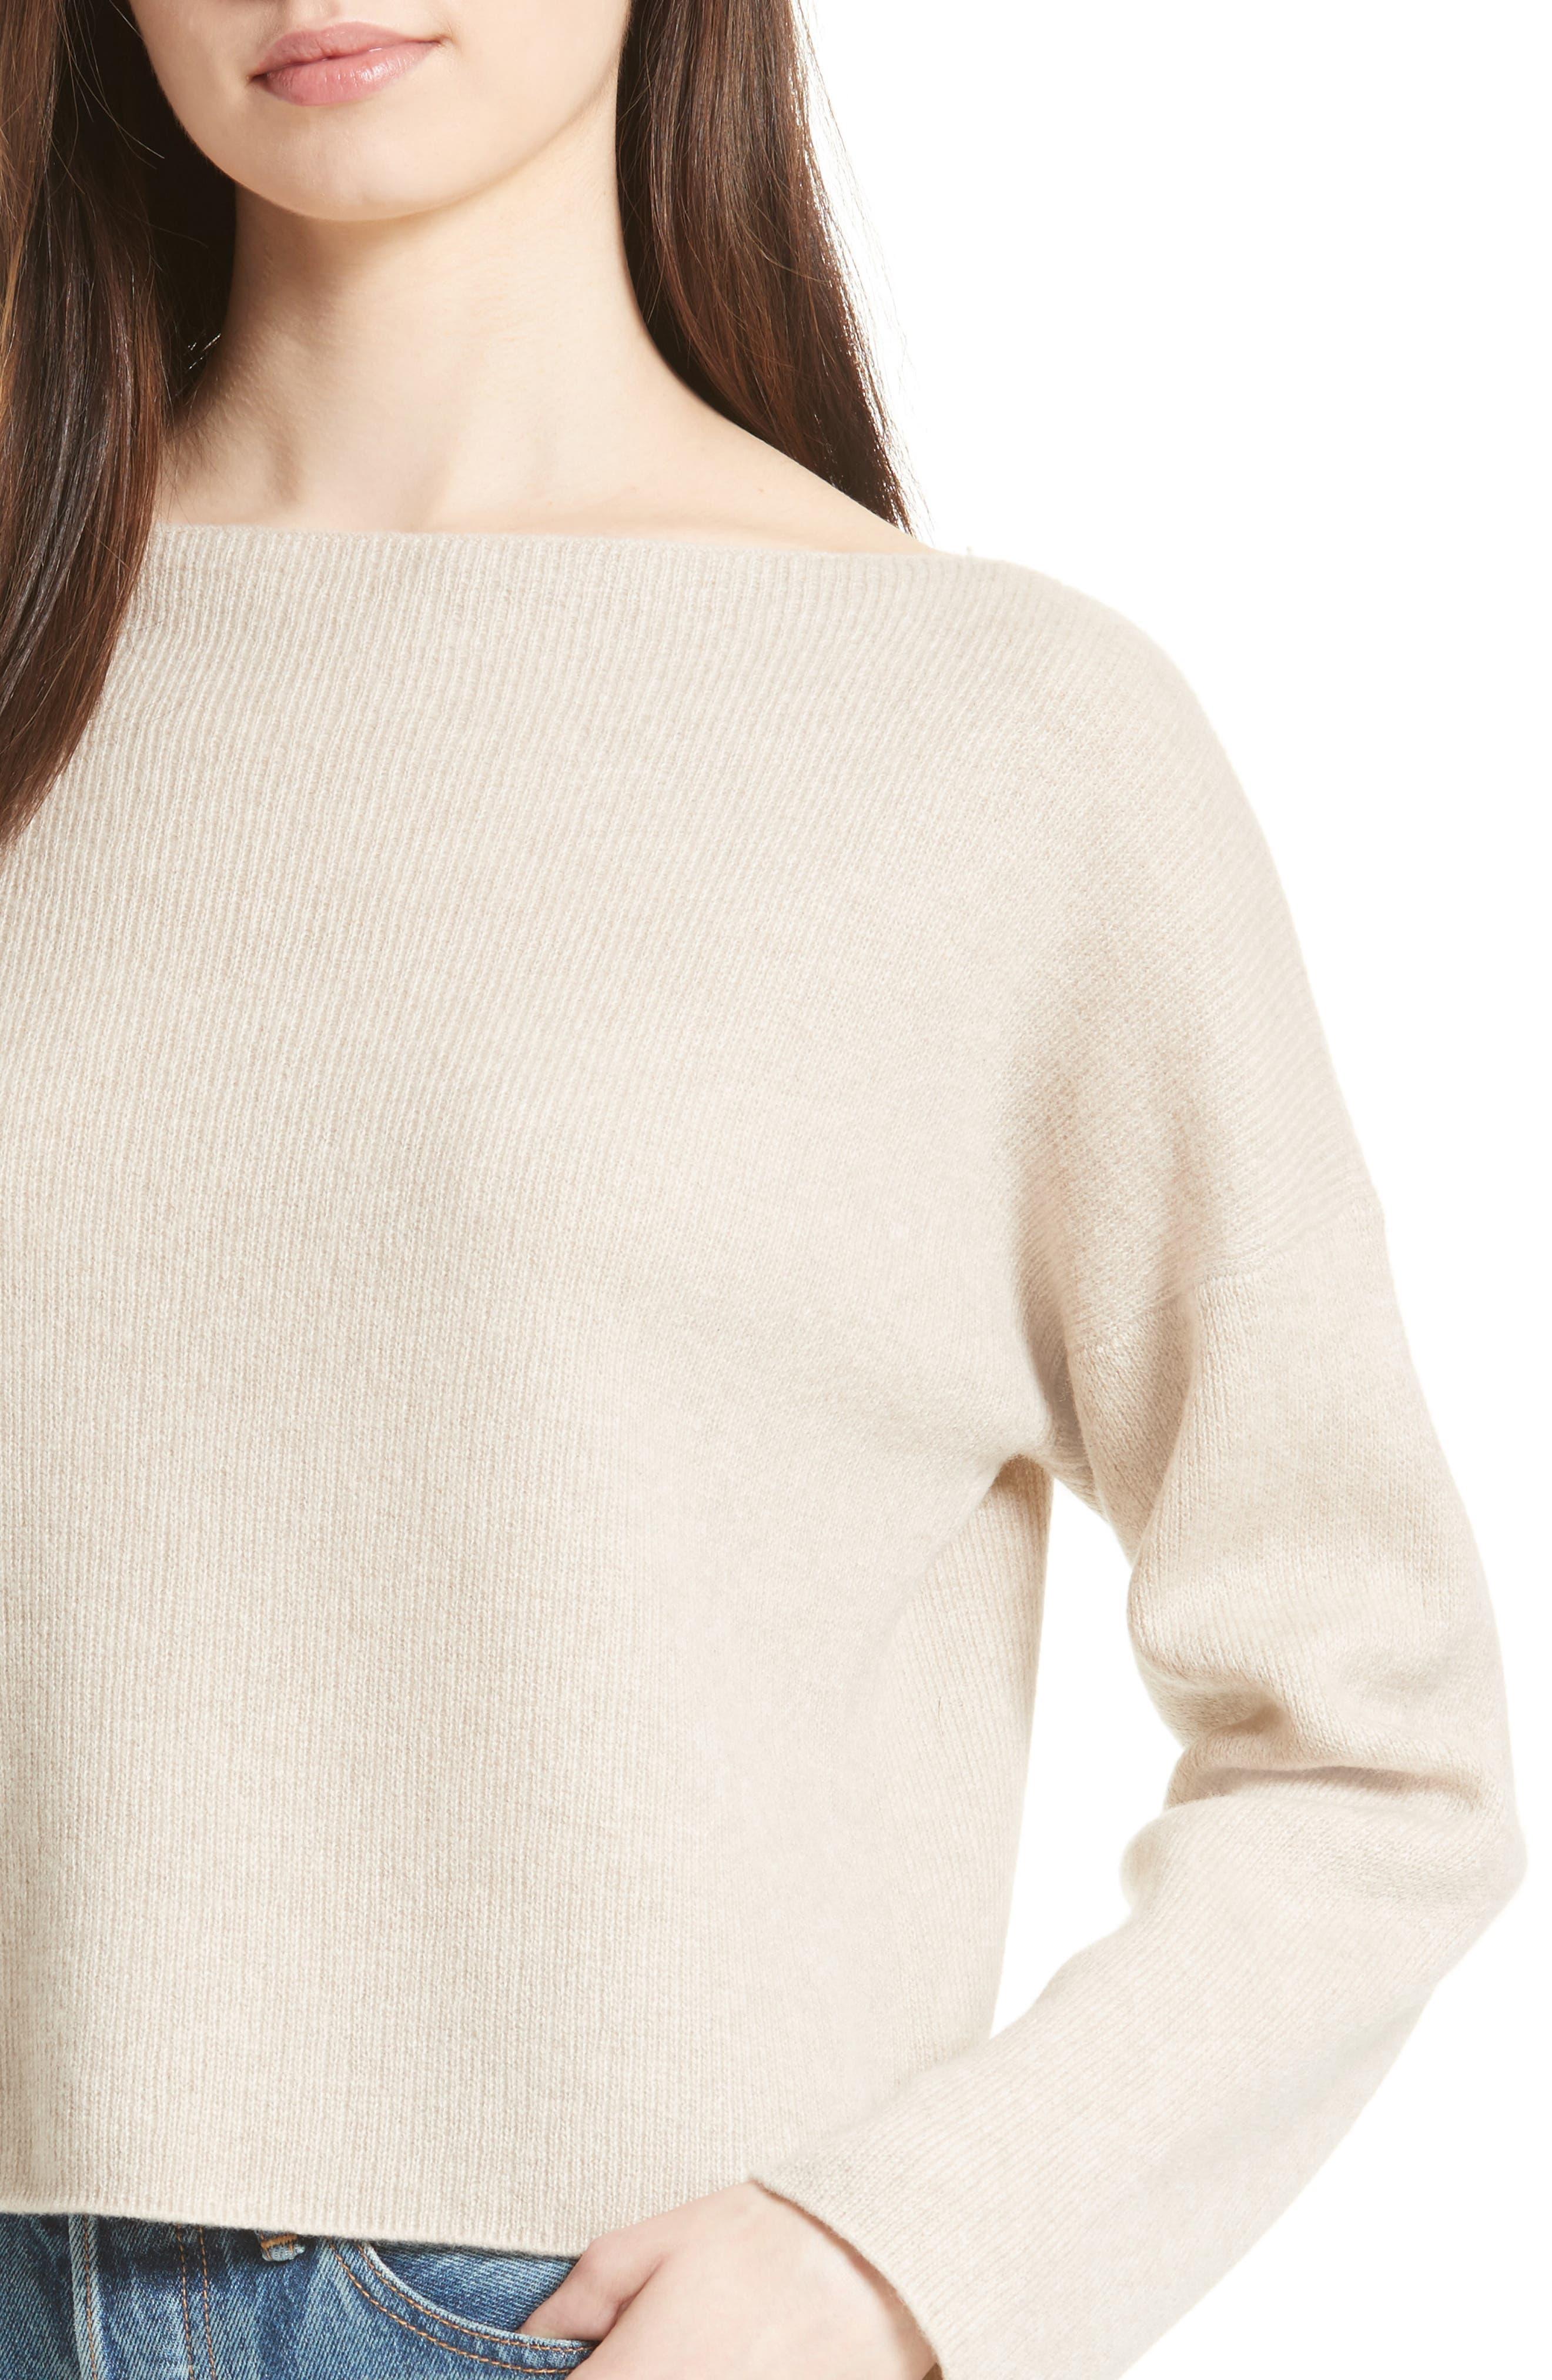 VINCE,                             Boxy Cashmere Sweater,                             Alternate thumbnail 4, color,                             233